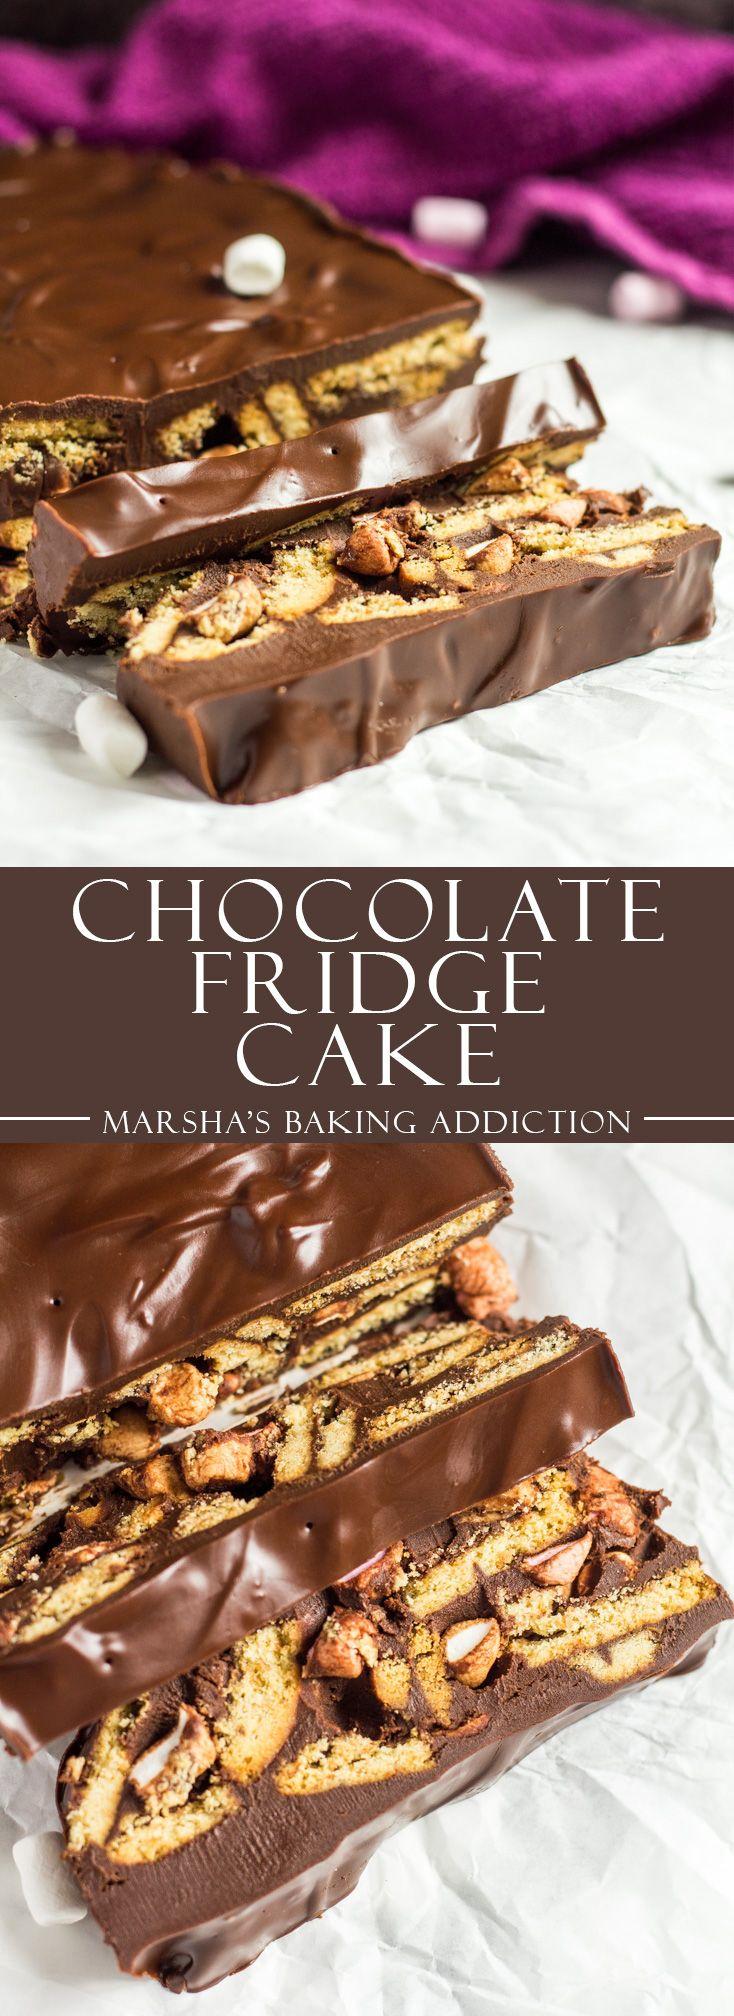 Chocolate Fridge Cake | marshasbakingaddiction.com @marshasbakeblog